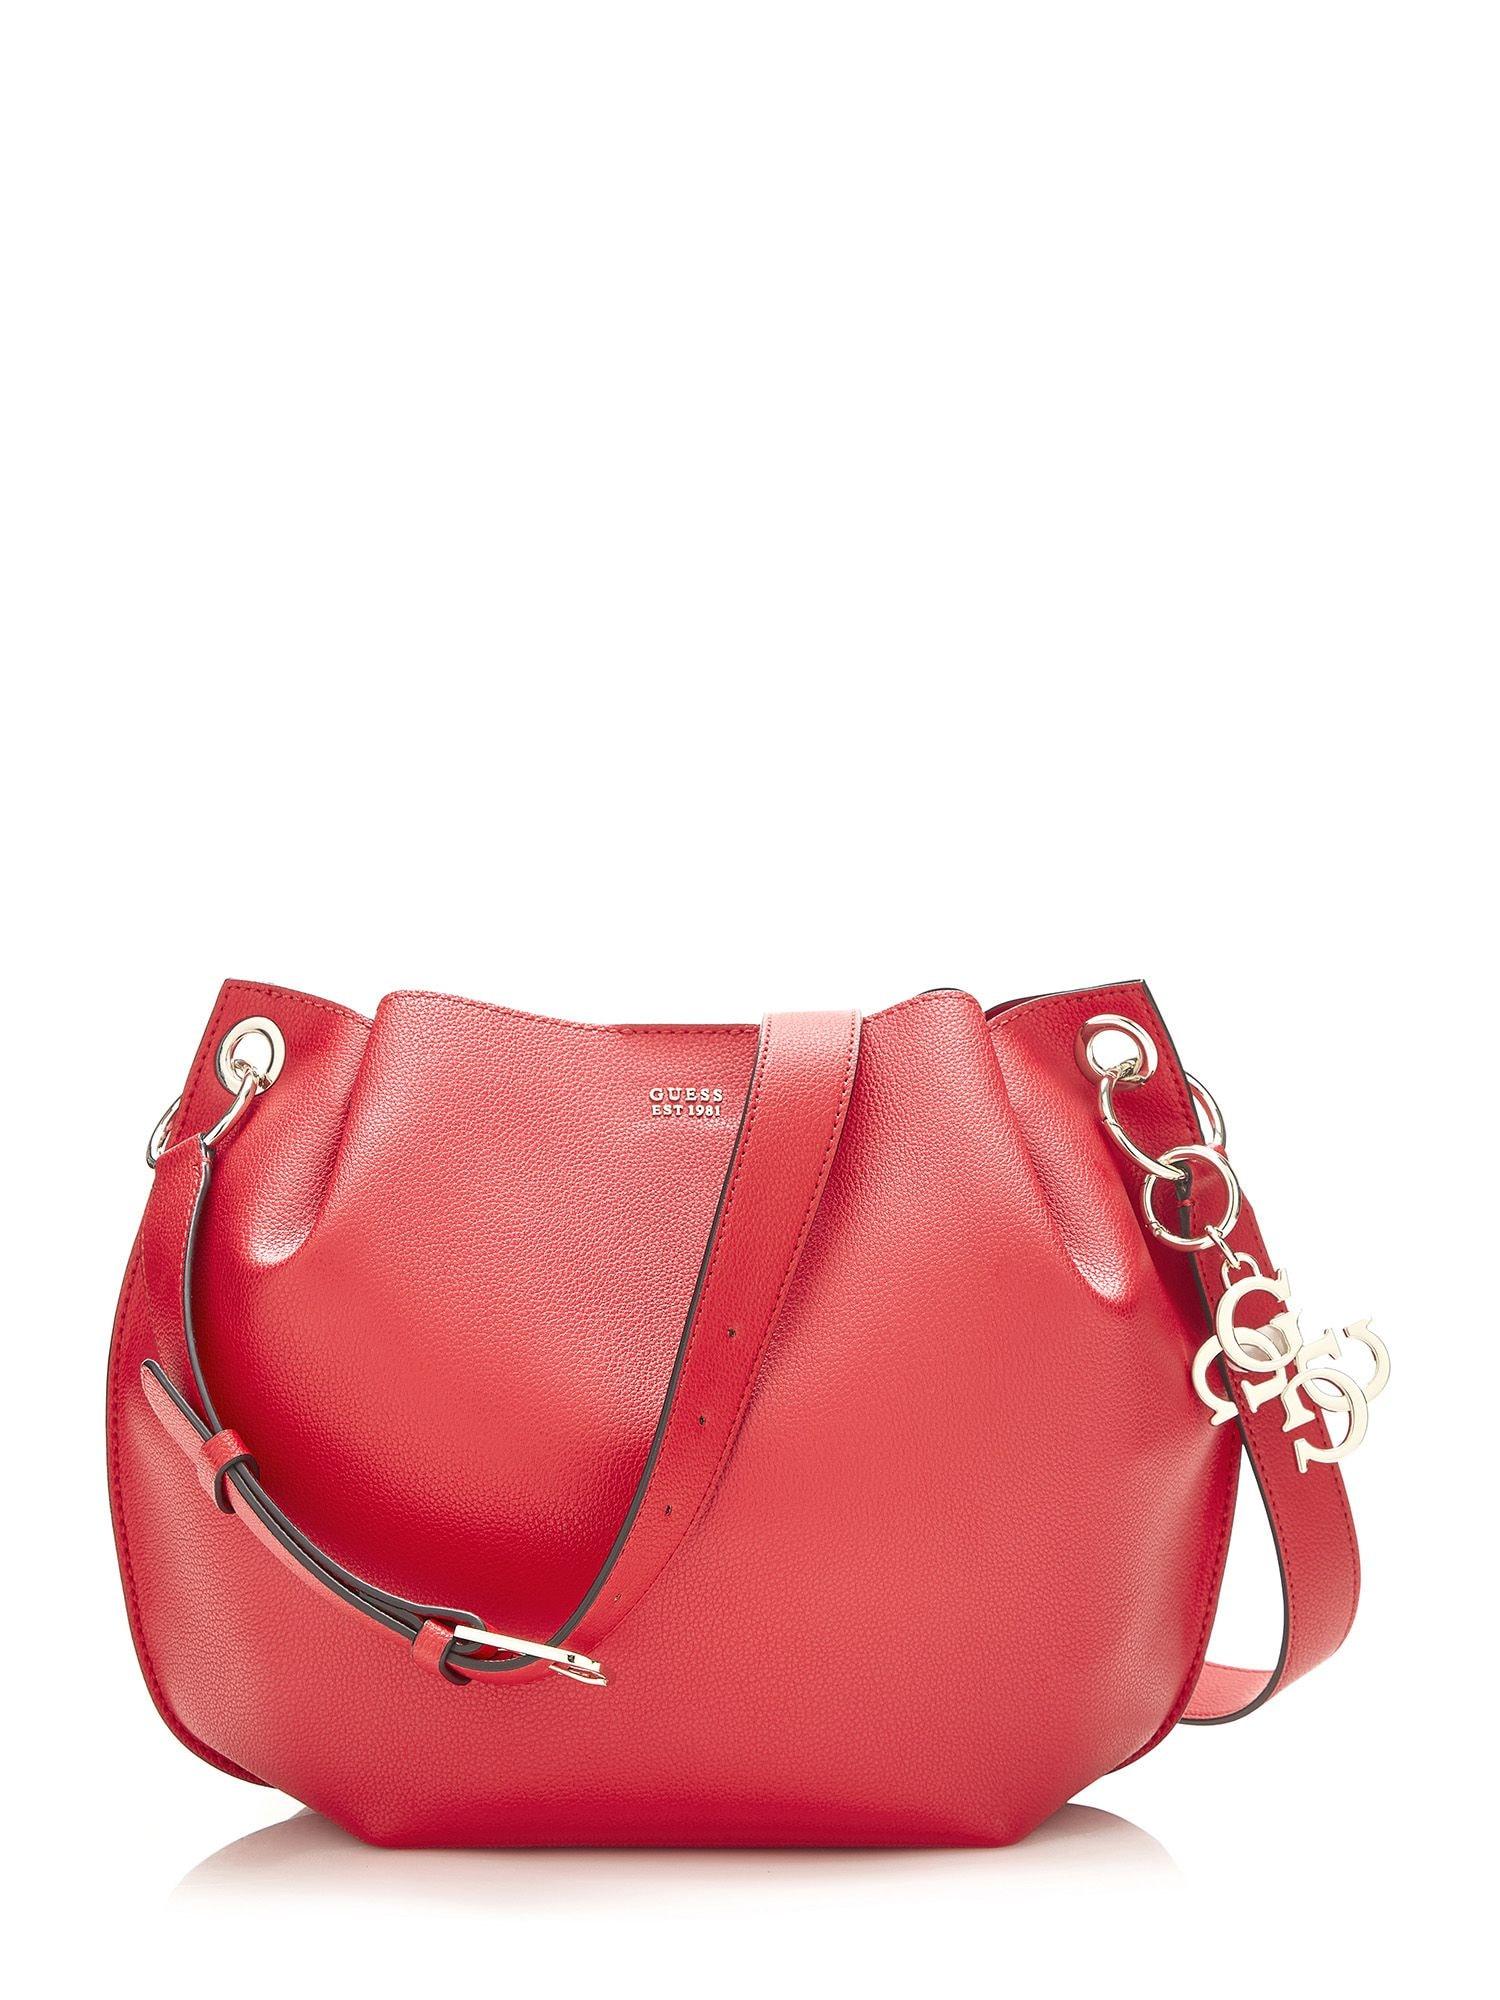 Beuteltasche 'Digital' | Taschen > Handtaschen > Beuteltaschen | Guess